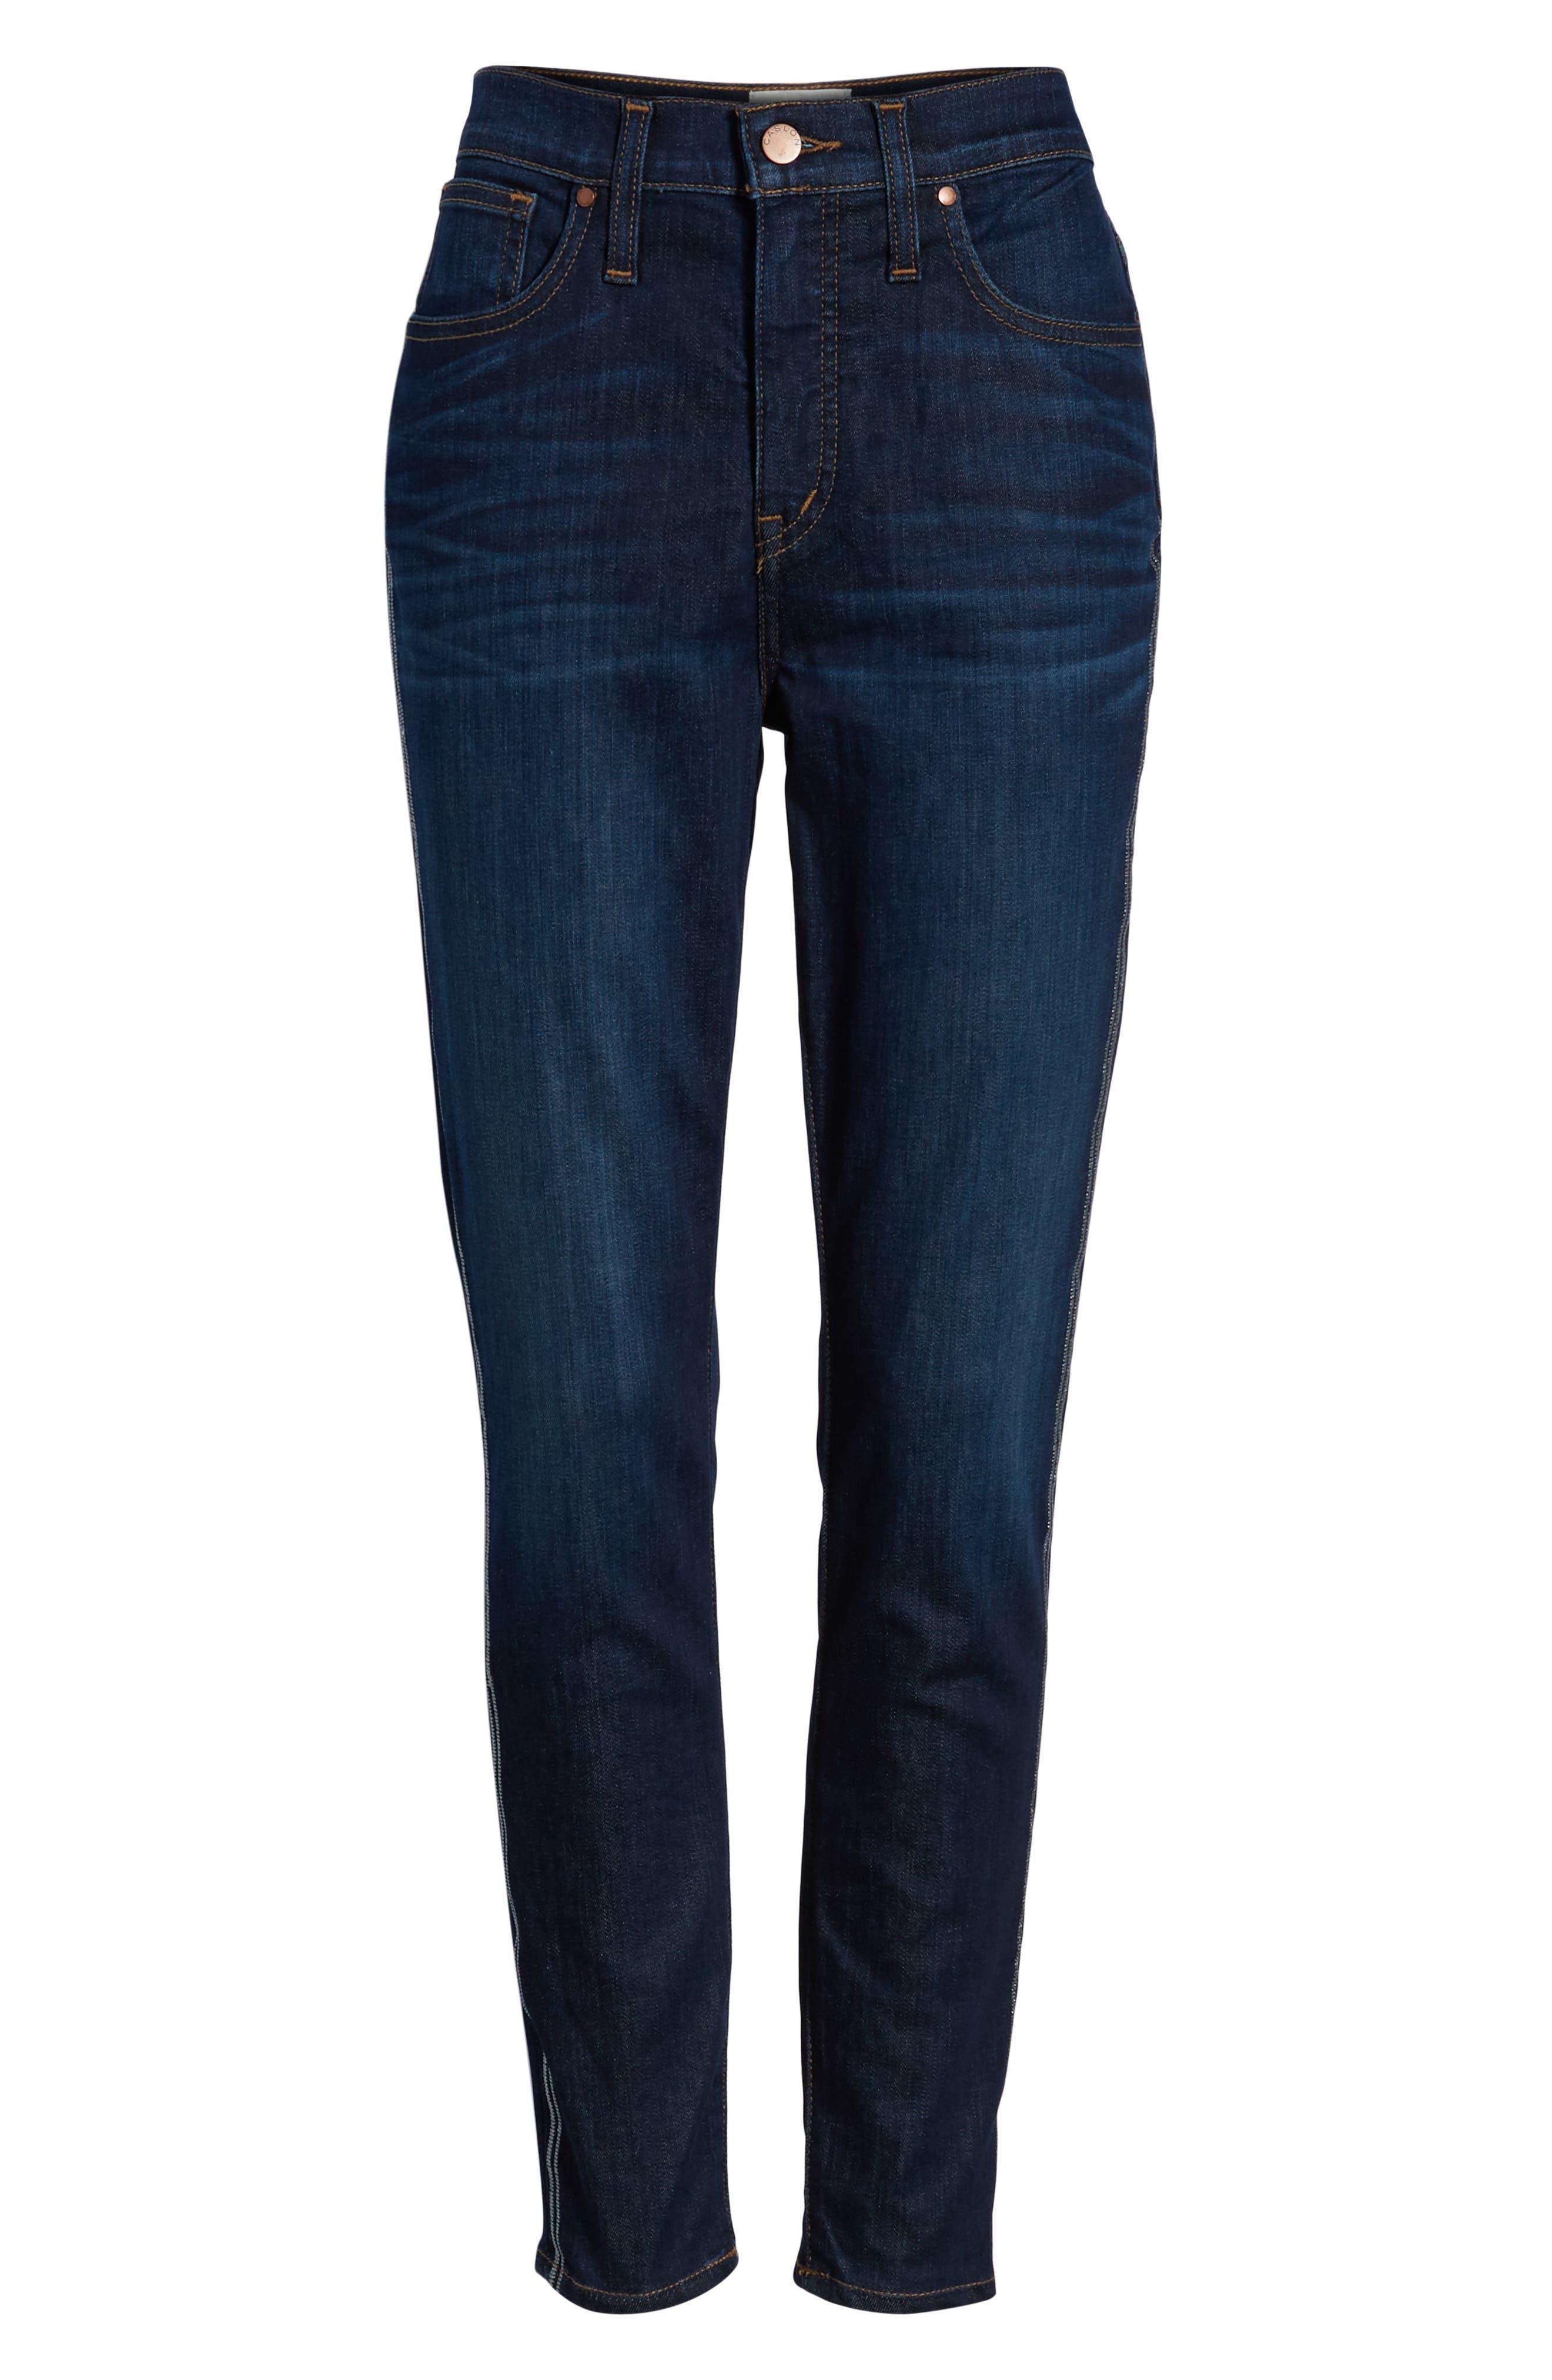 Sierra High Waist Ankle Skinny Jeans,                             Alternate thumbnail 7, color,                             FRANCIS